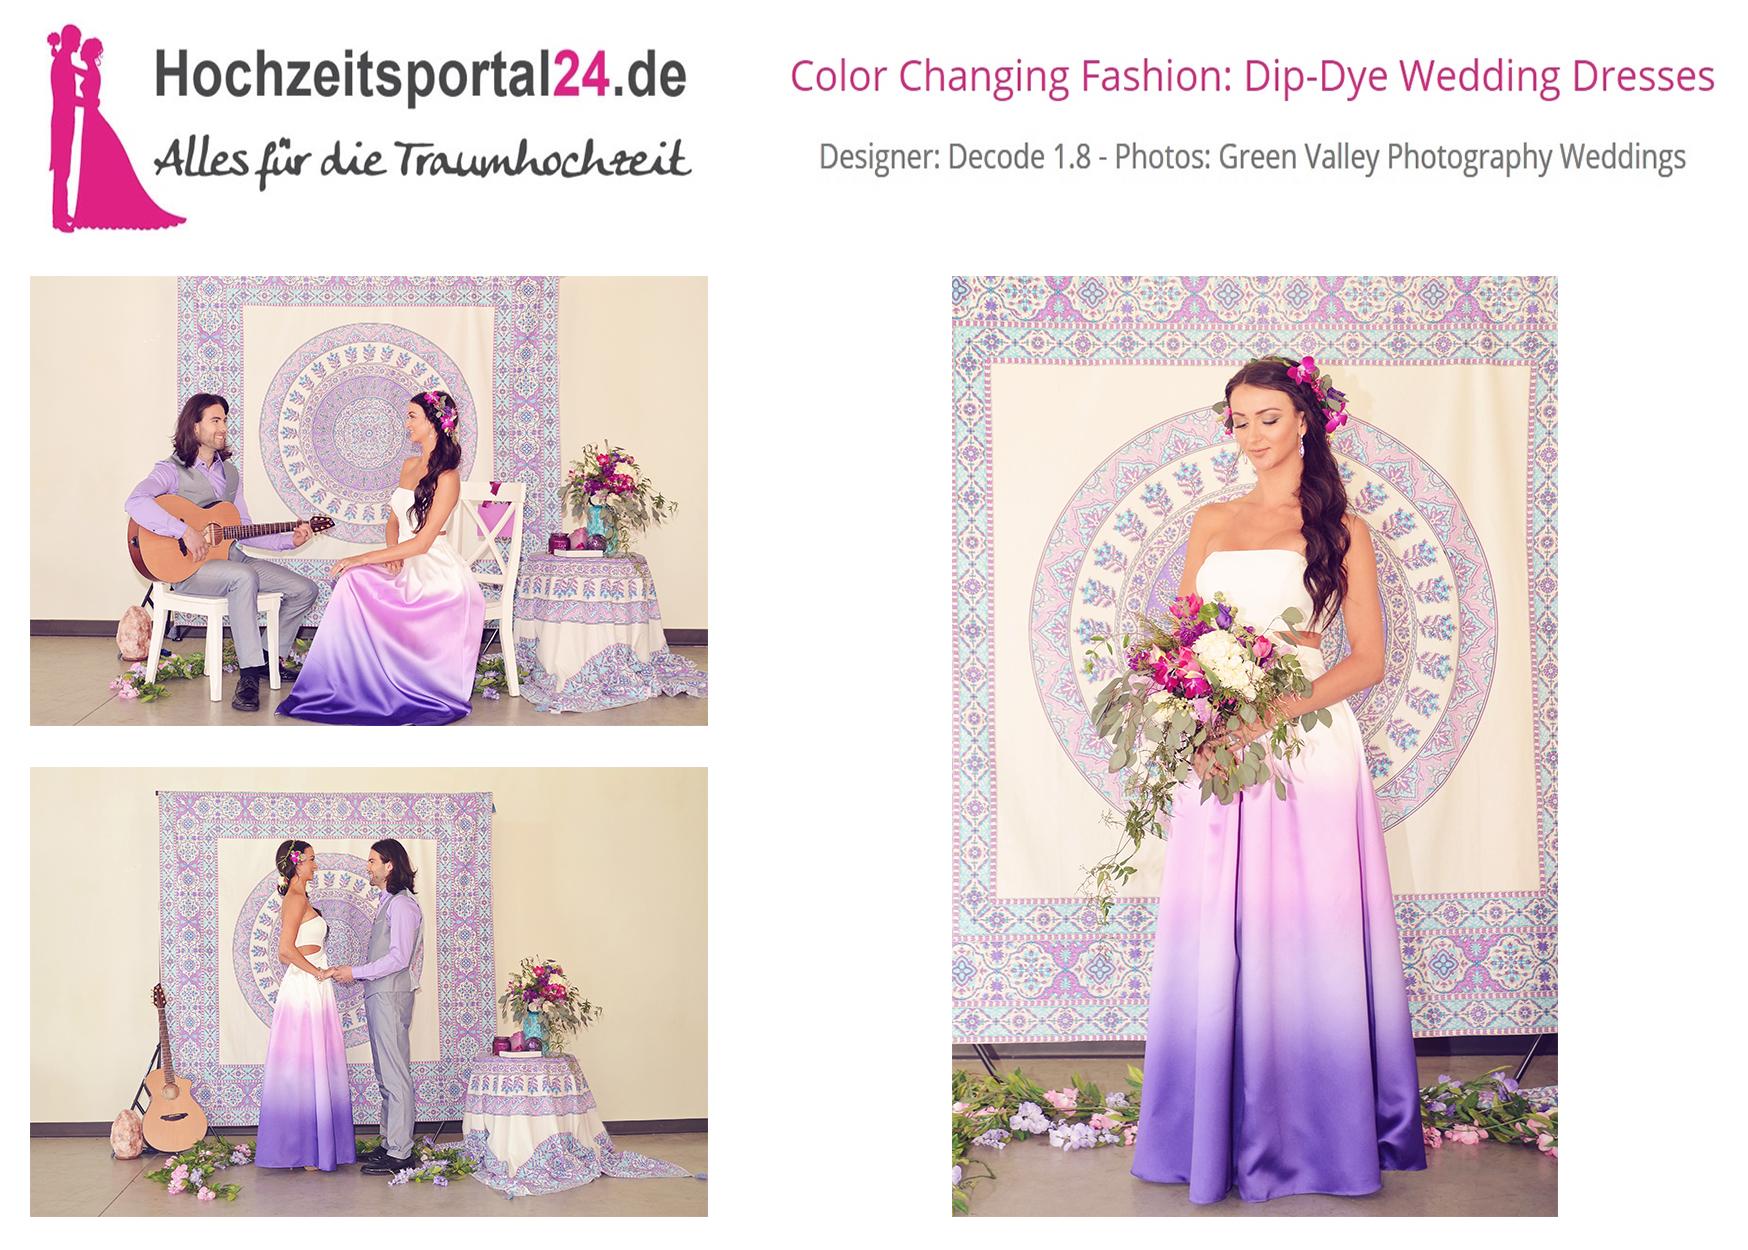 Germany's Hochzeitsportal24